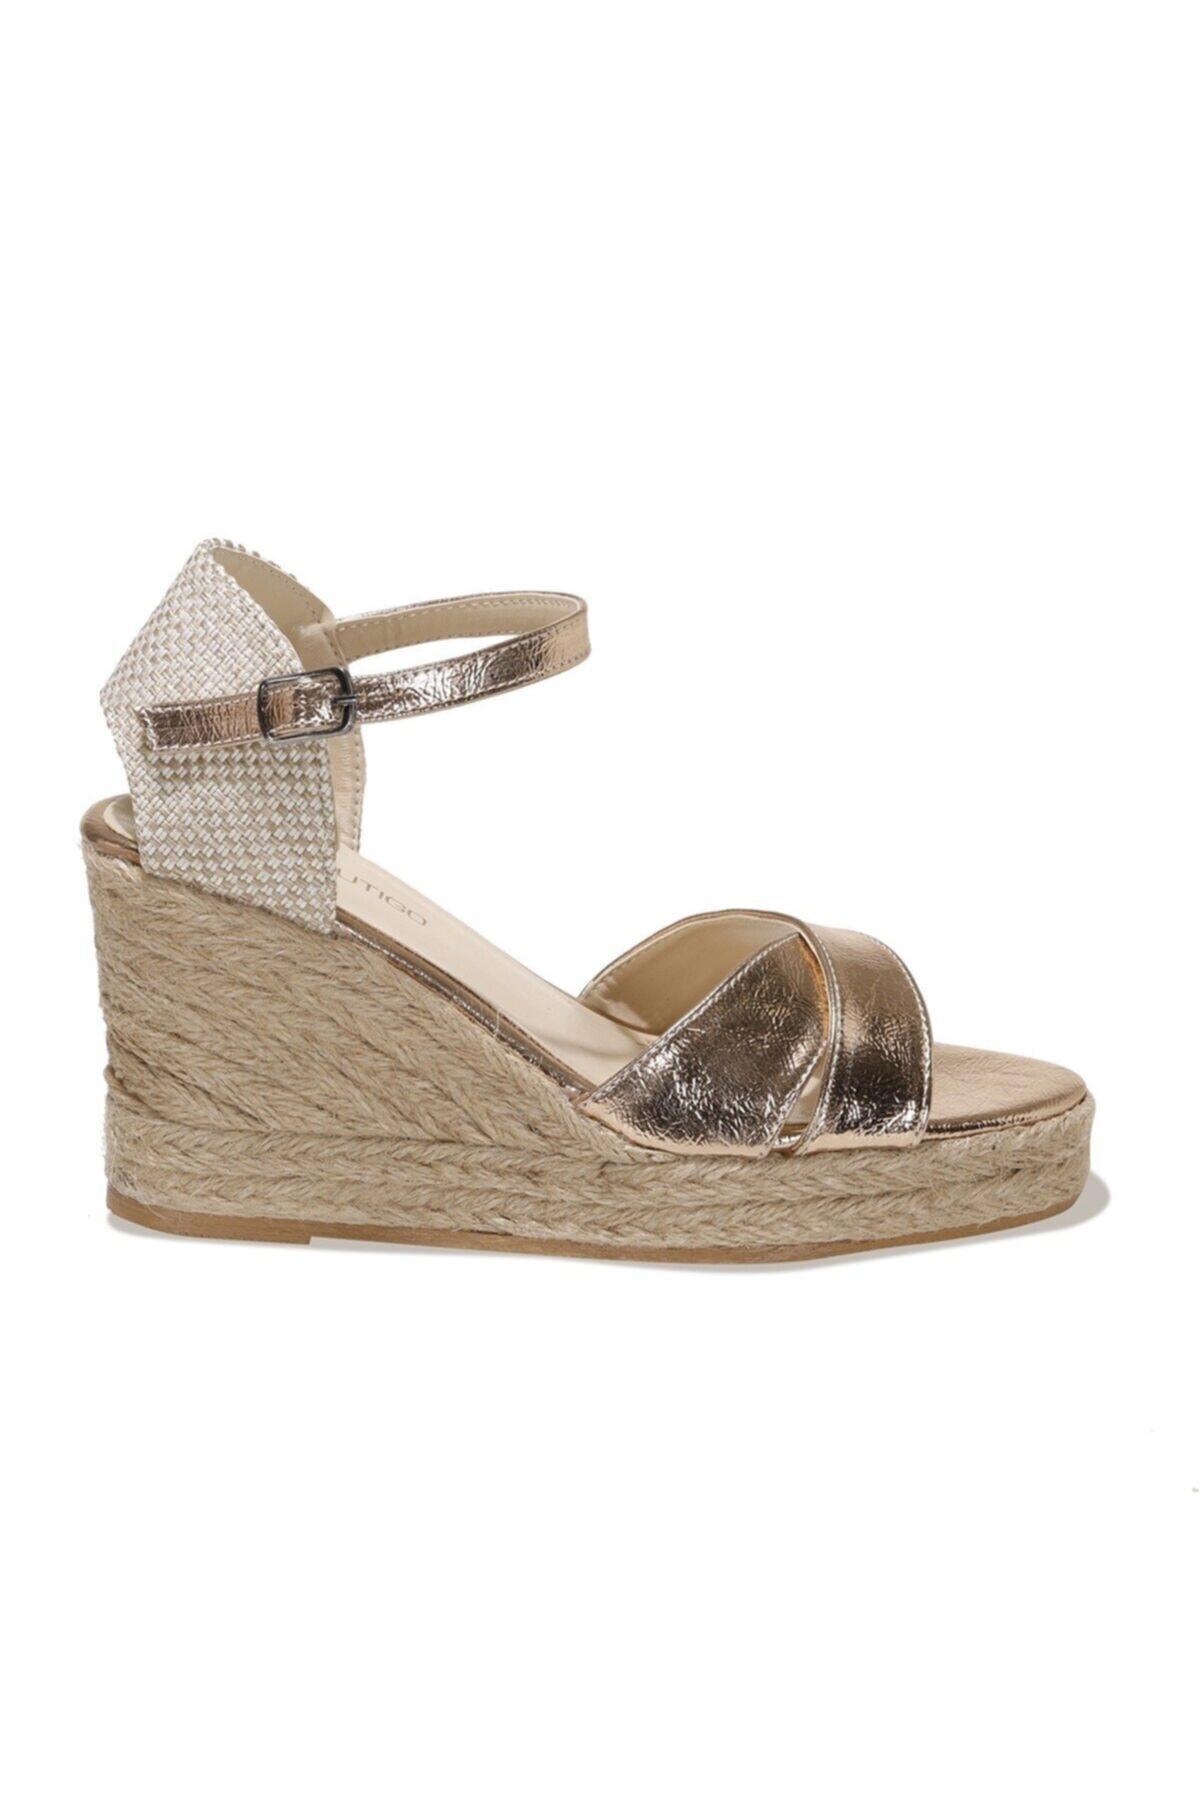 21S-3121FX Rose Gold Kadın Dolgu Topuklu Sandalet 101014457